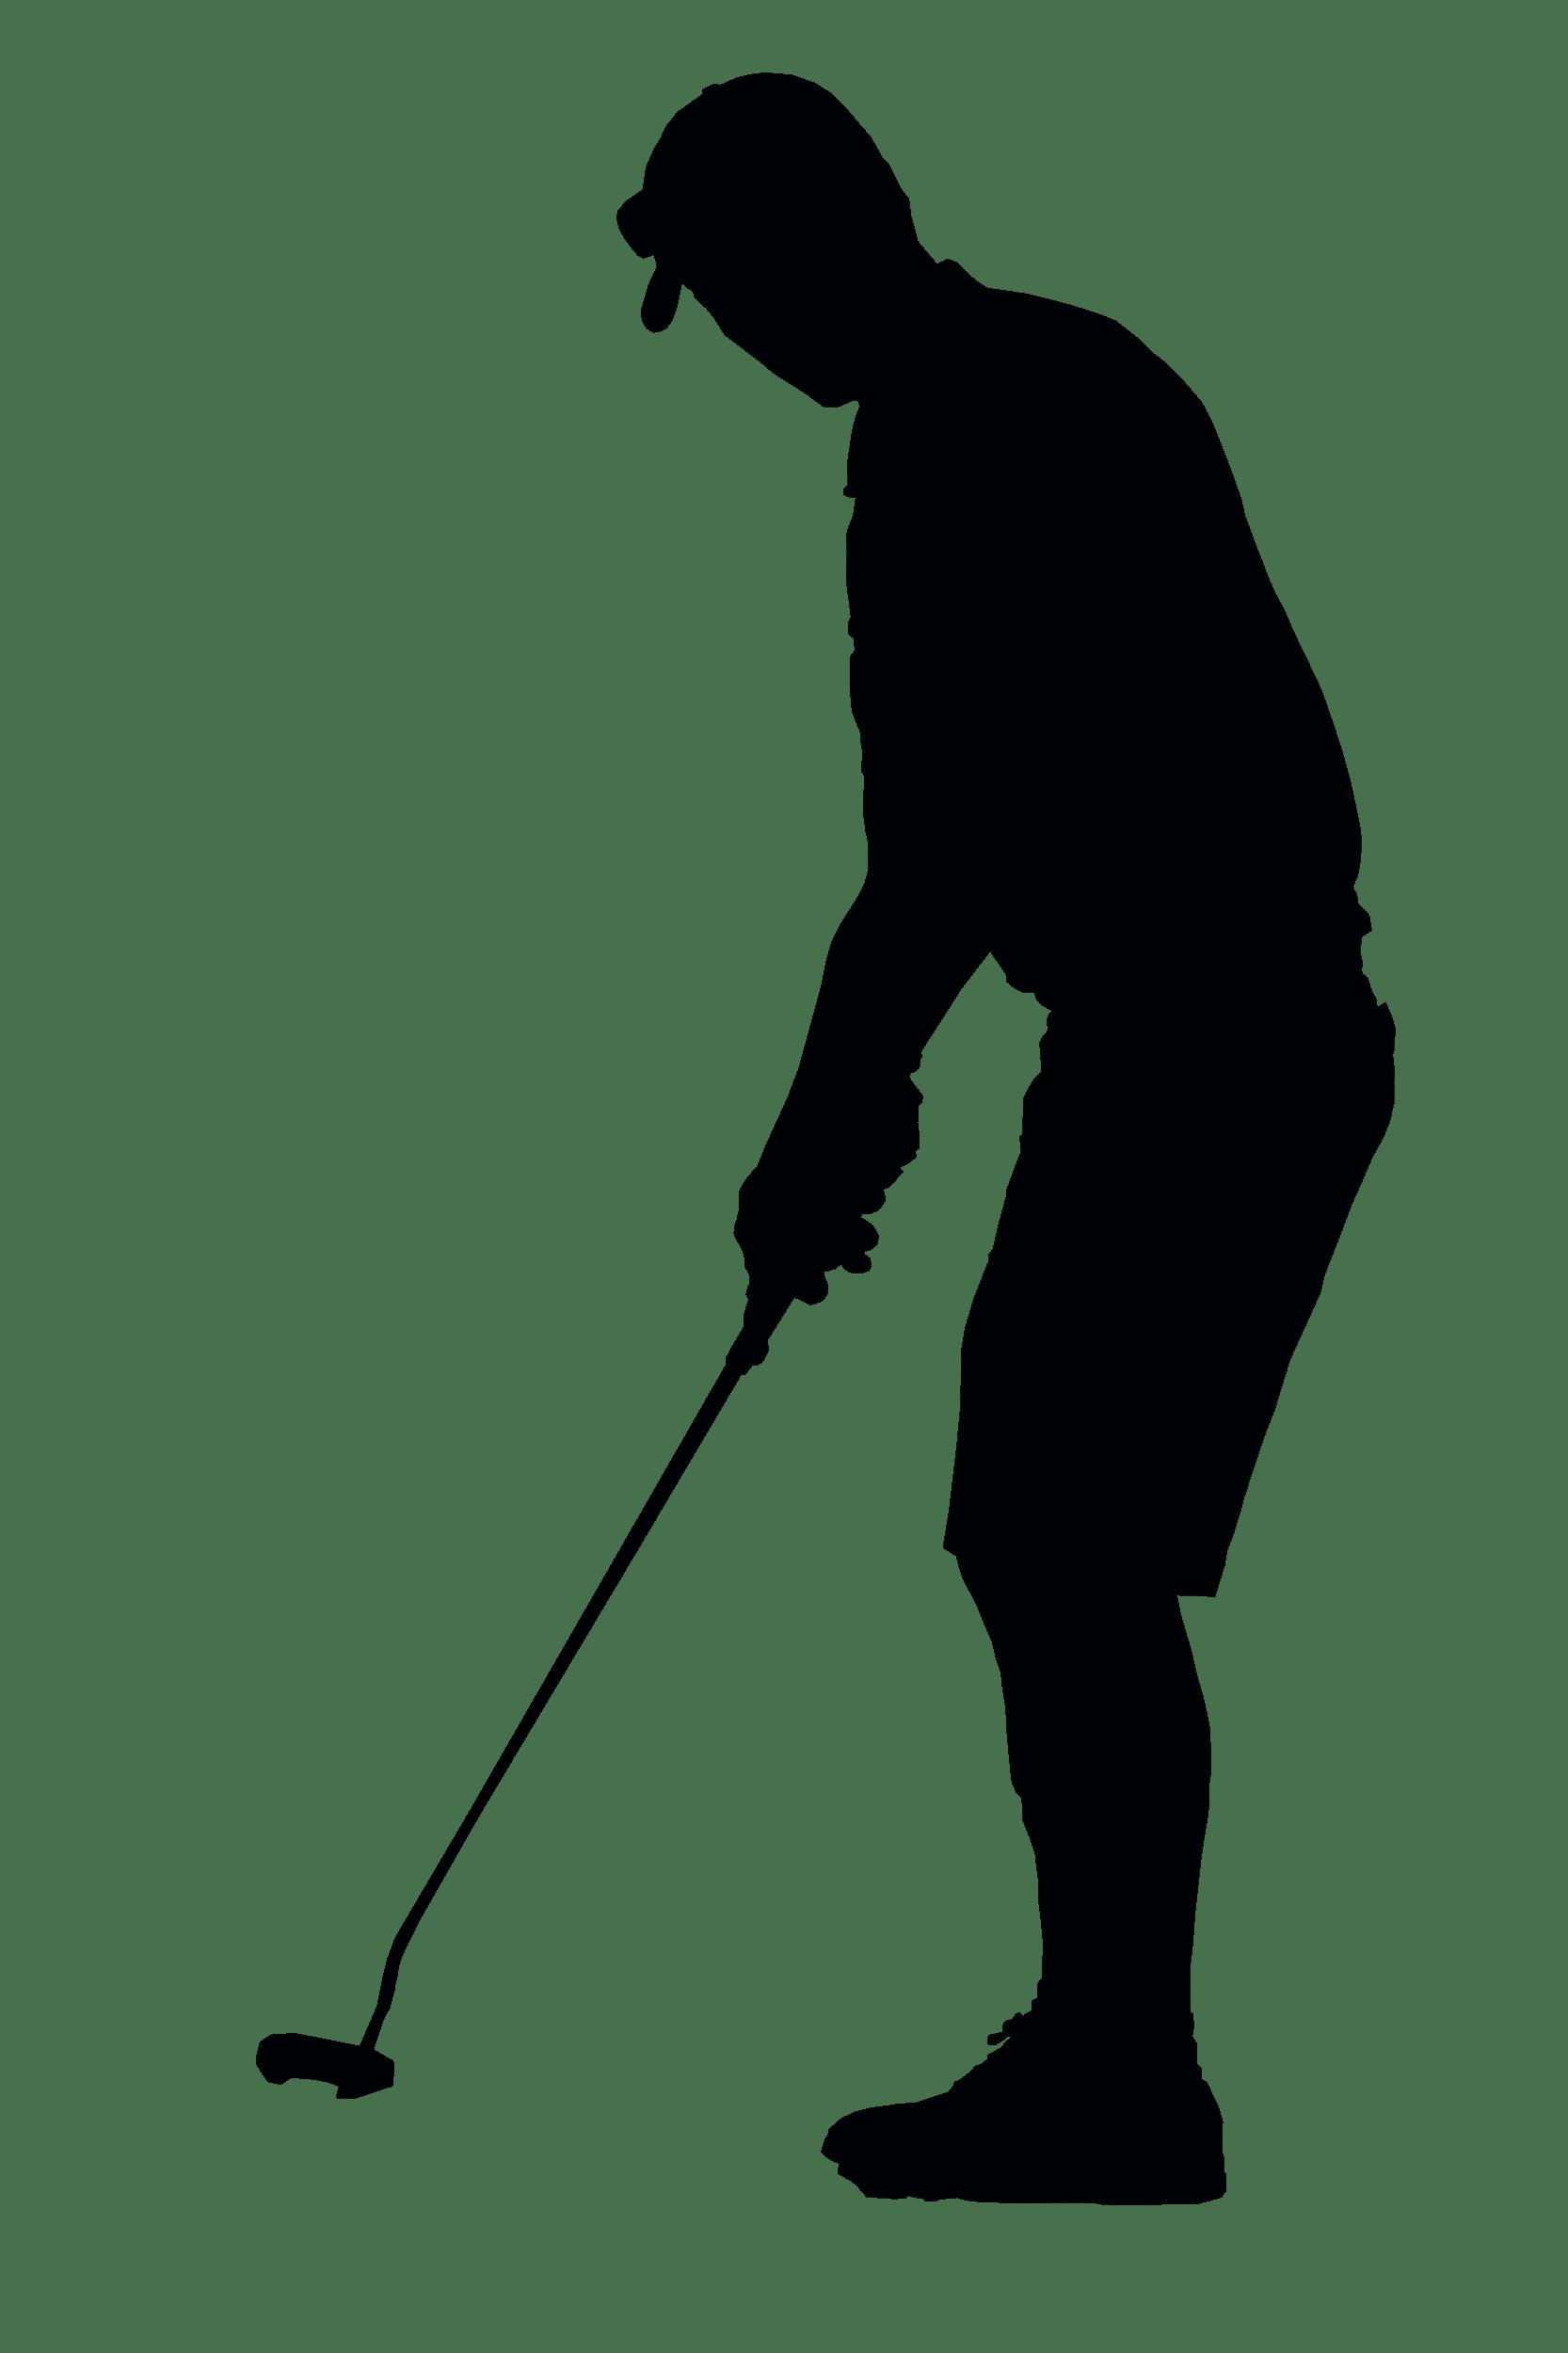 1666x2500 Nike Golf Club Heads Transparent Png